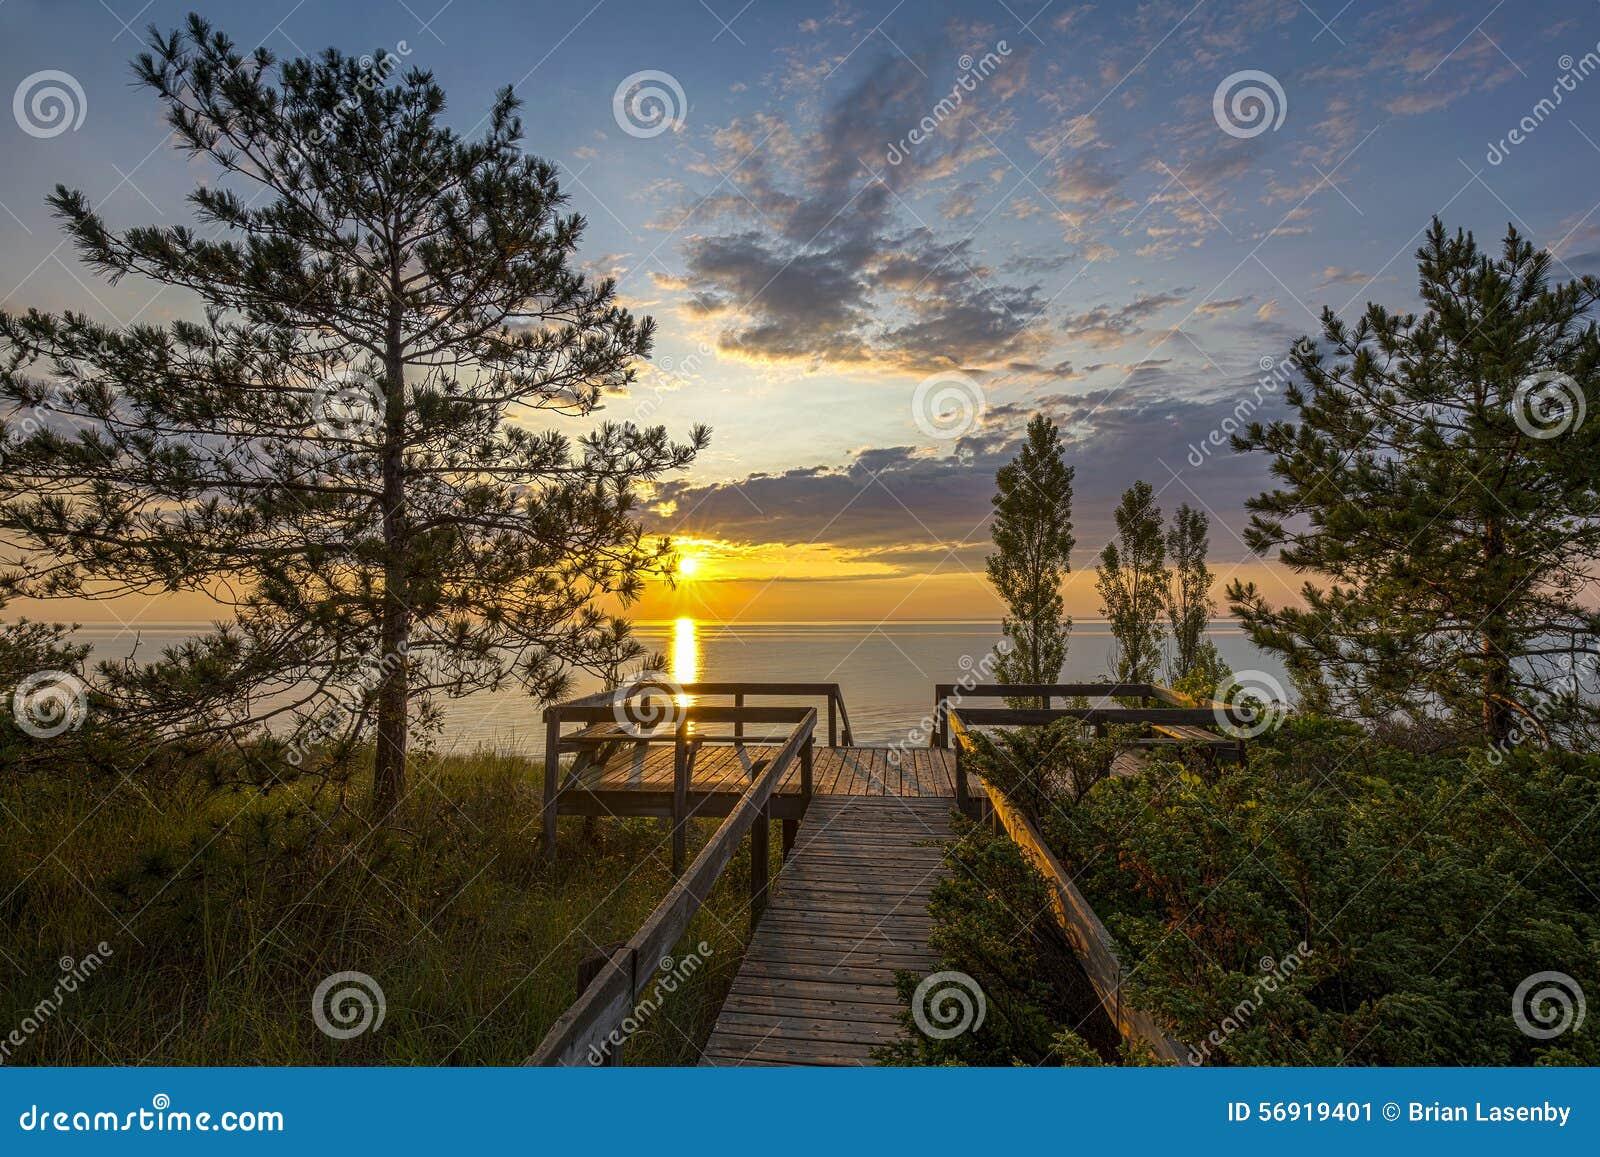 Huron λιμνών θαλάσσιος περίπατος στο ηλιοβασίλεμα